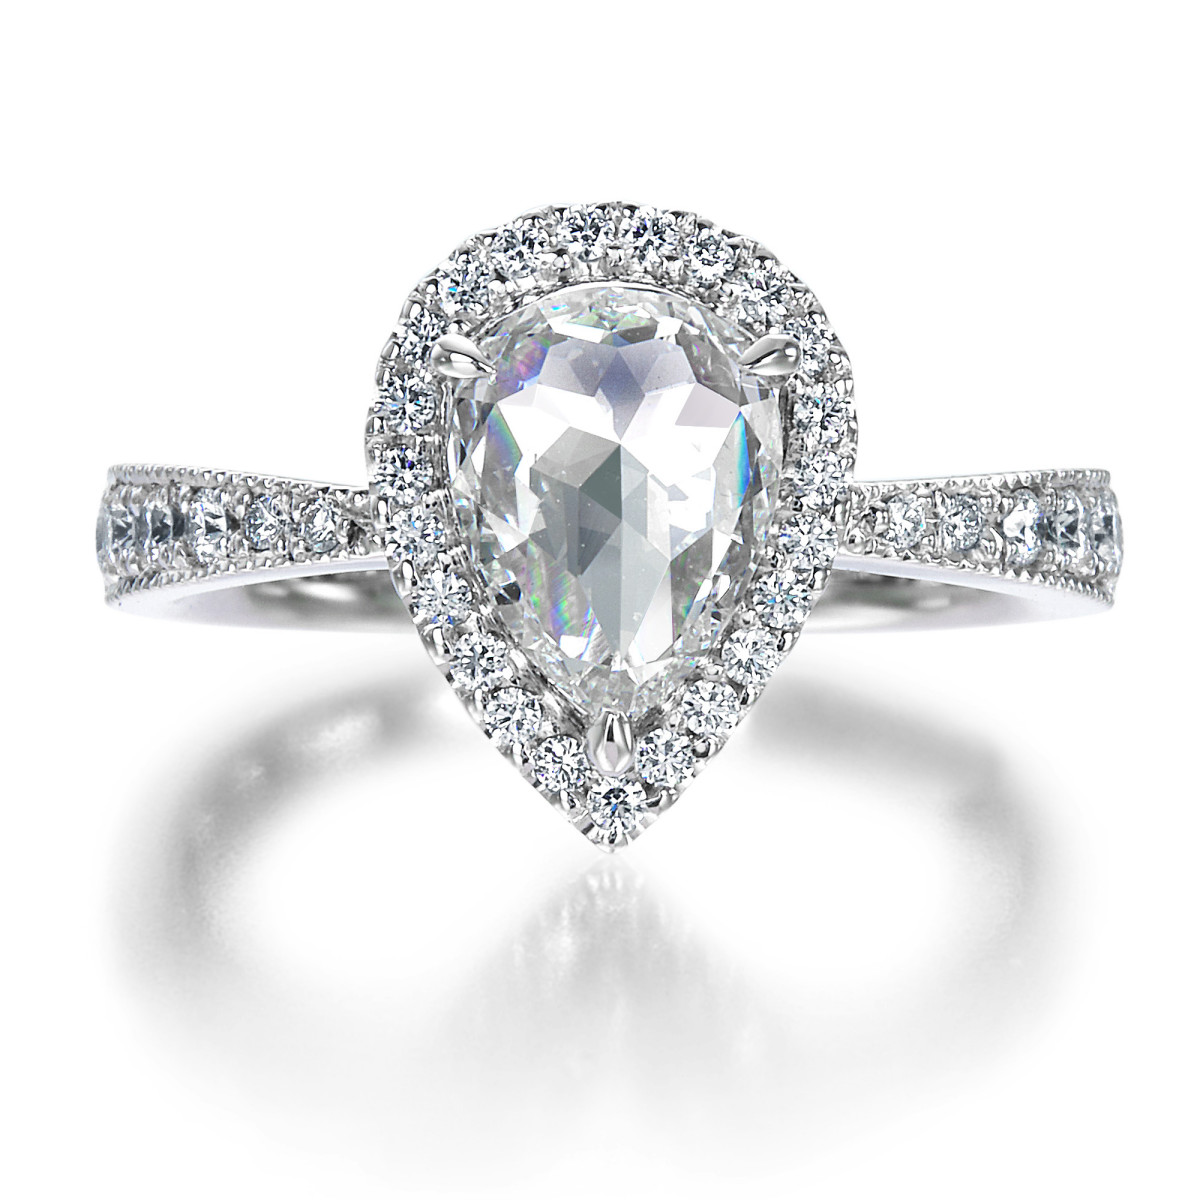 1 CT PEAR SHAPE ROSE CUT DIAMOND RING BY MARK HIROSHI WILLIS